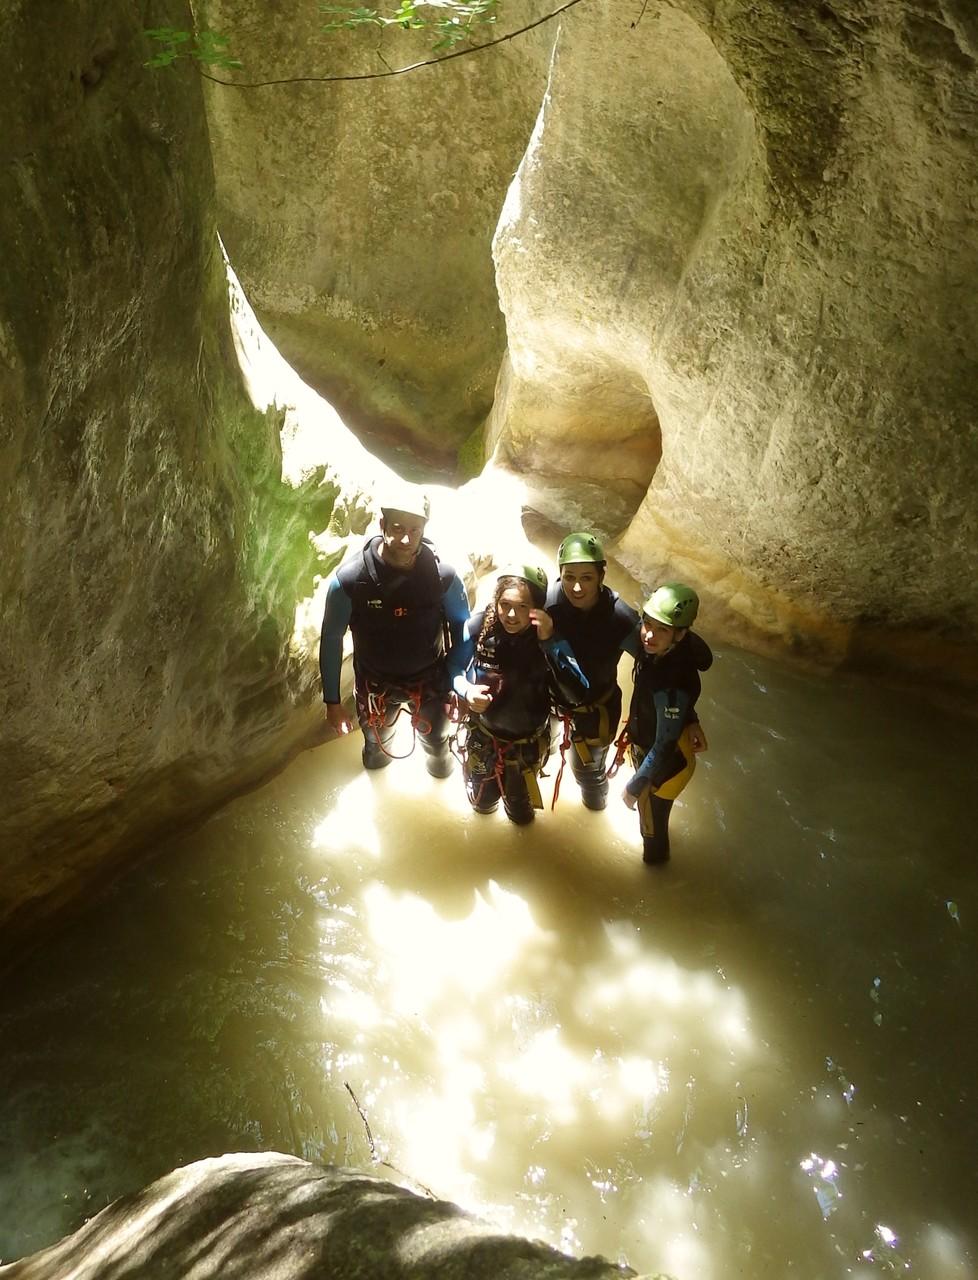 Sortie canyoning en famille à Gresse en Vercors